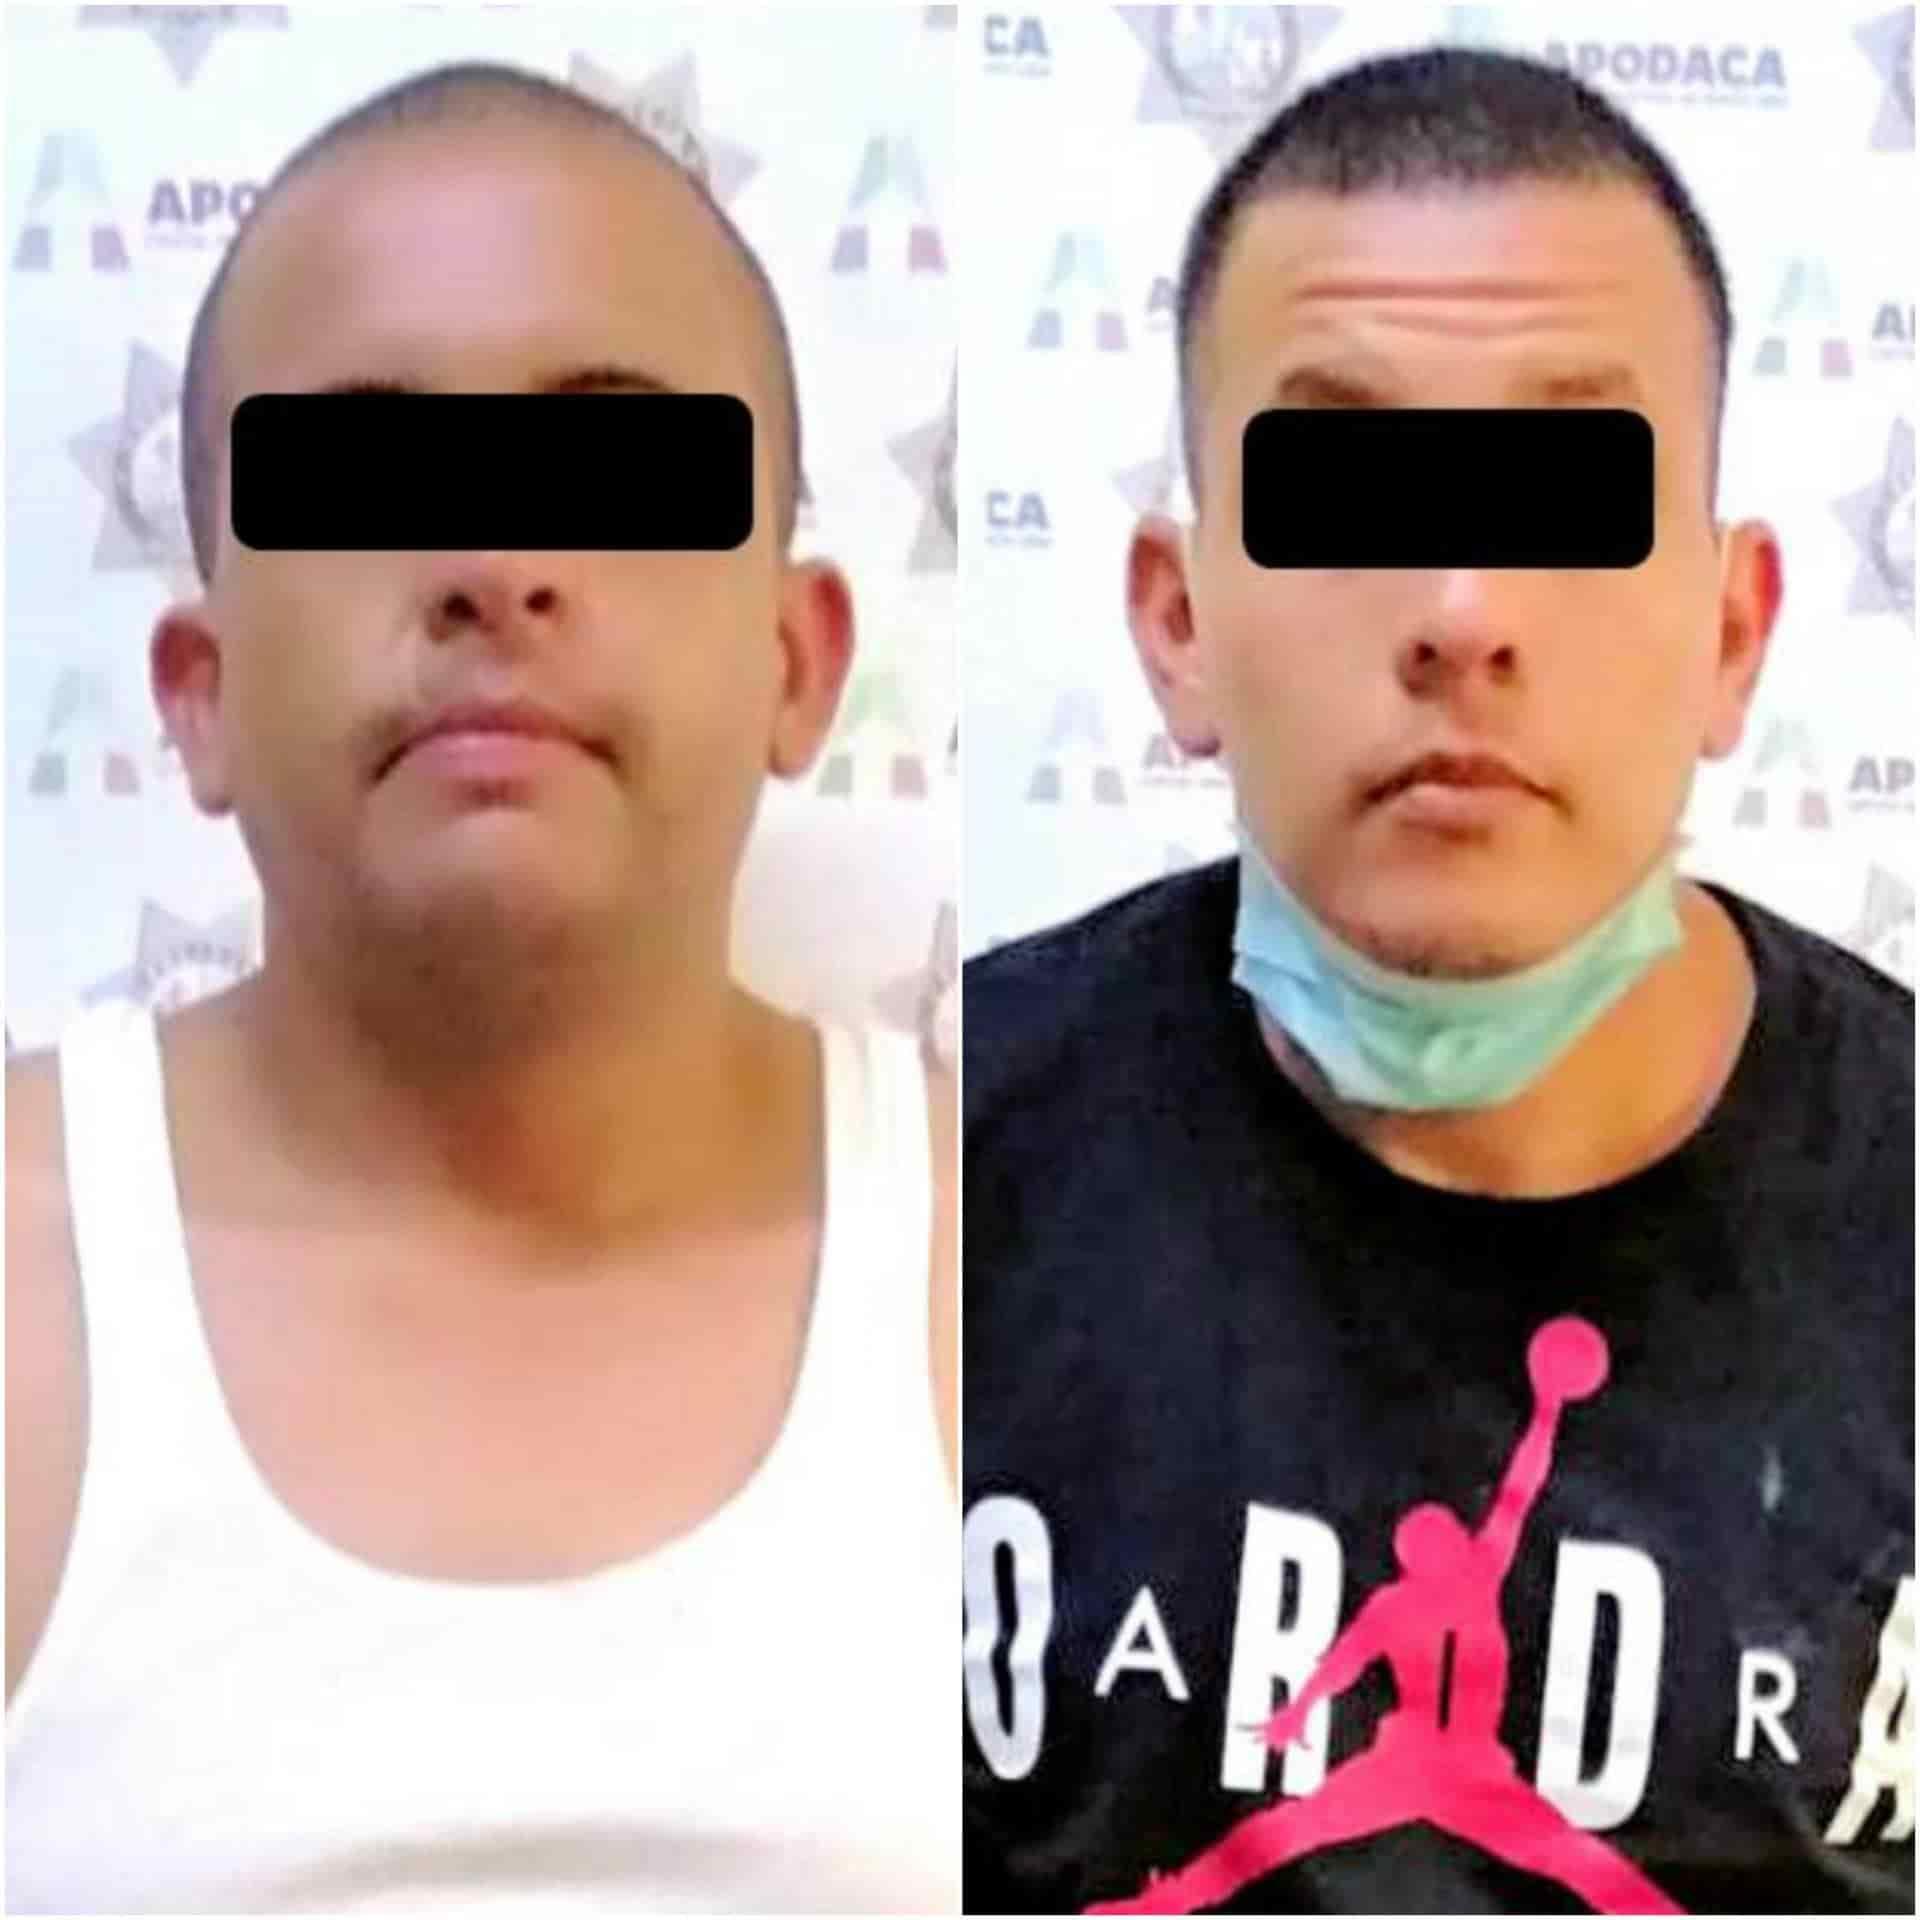 Lograron detener a tres narcotraficantes, que transportaban 35 kilos de mariguana